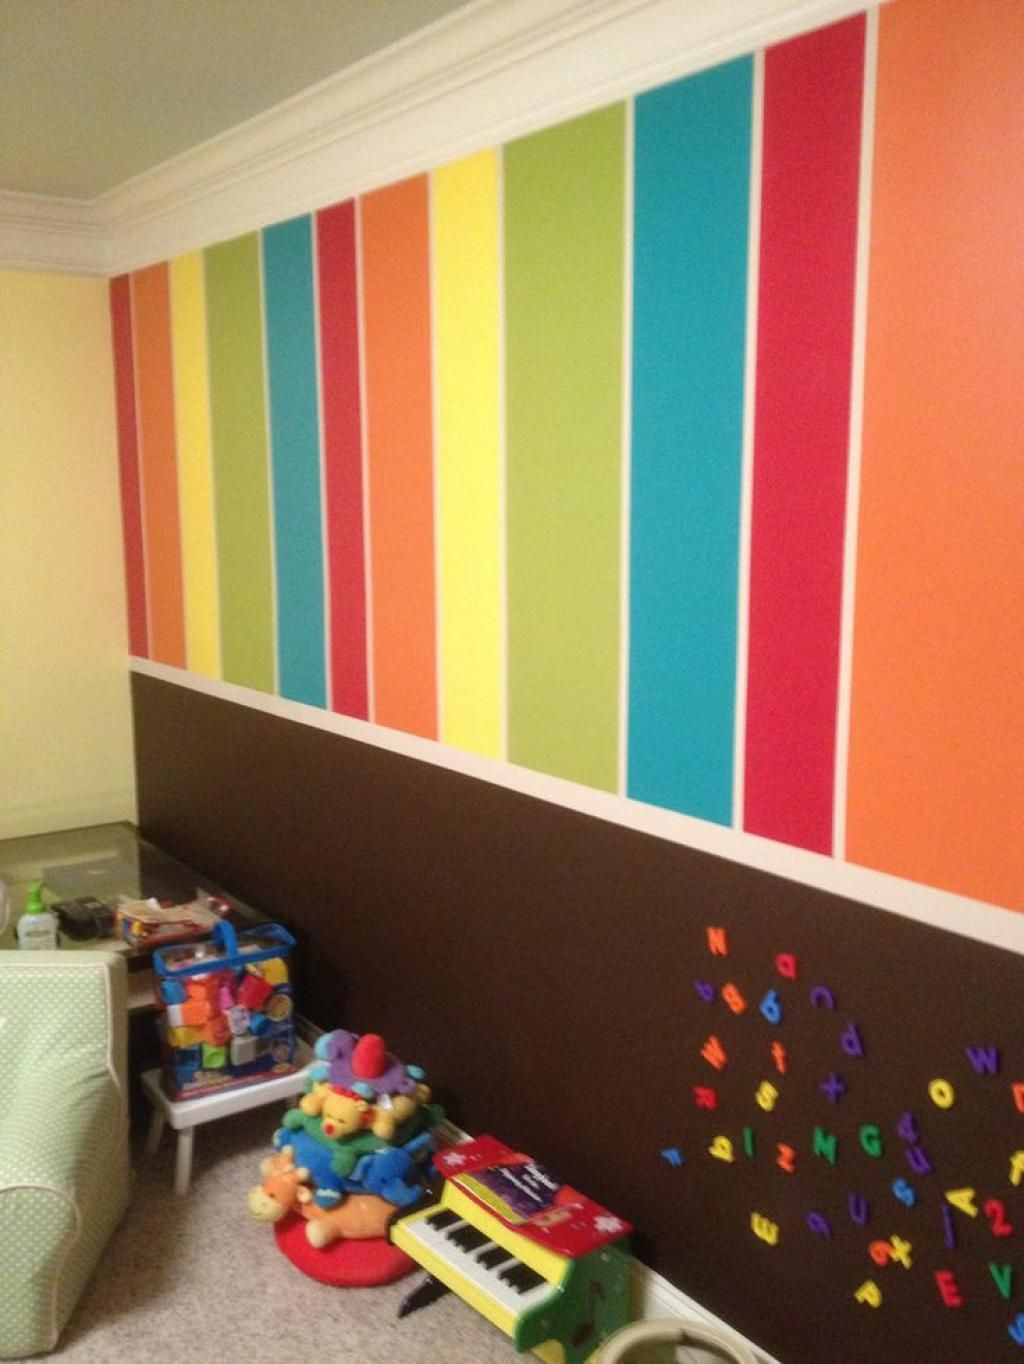 Washable Paint For Wall Playroom Paint Playroom Paint Colors Playroom Wall